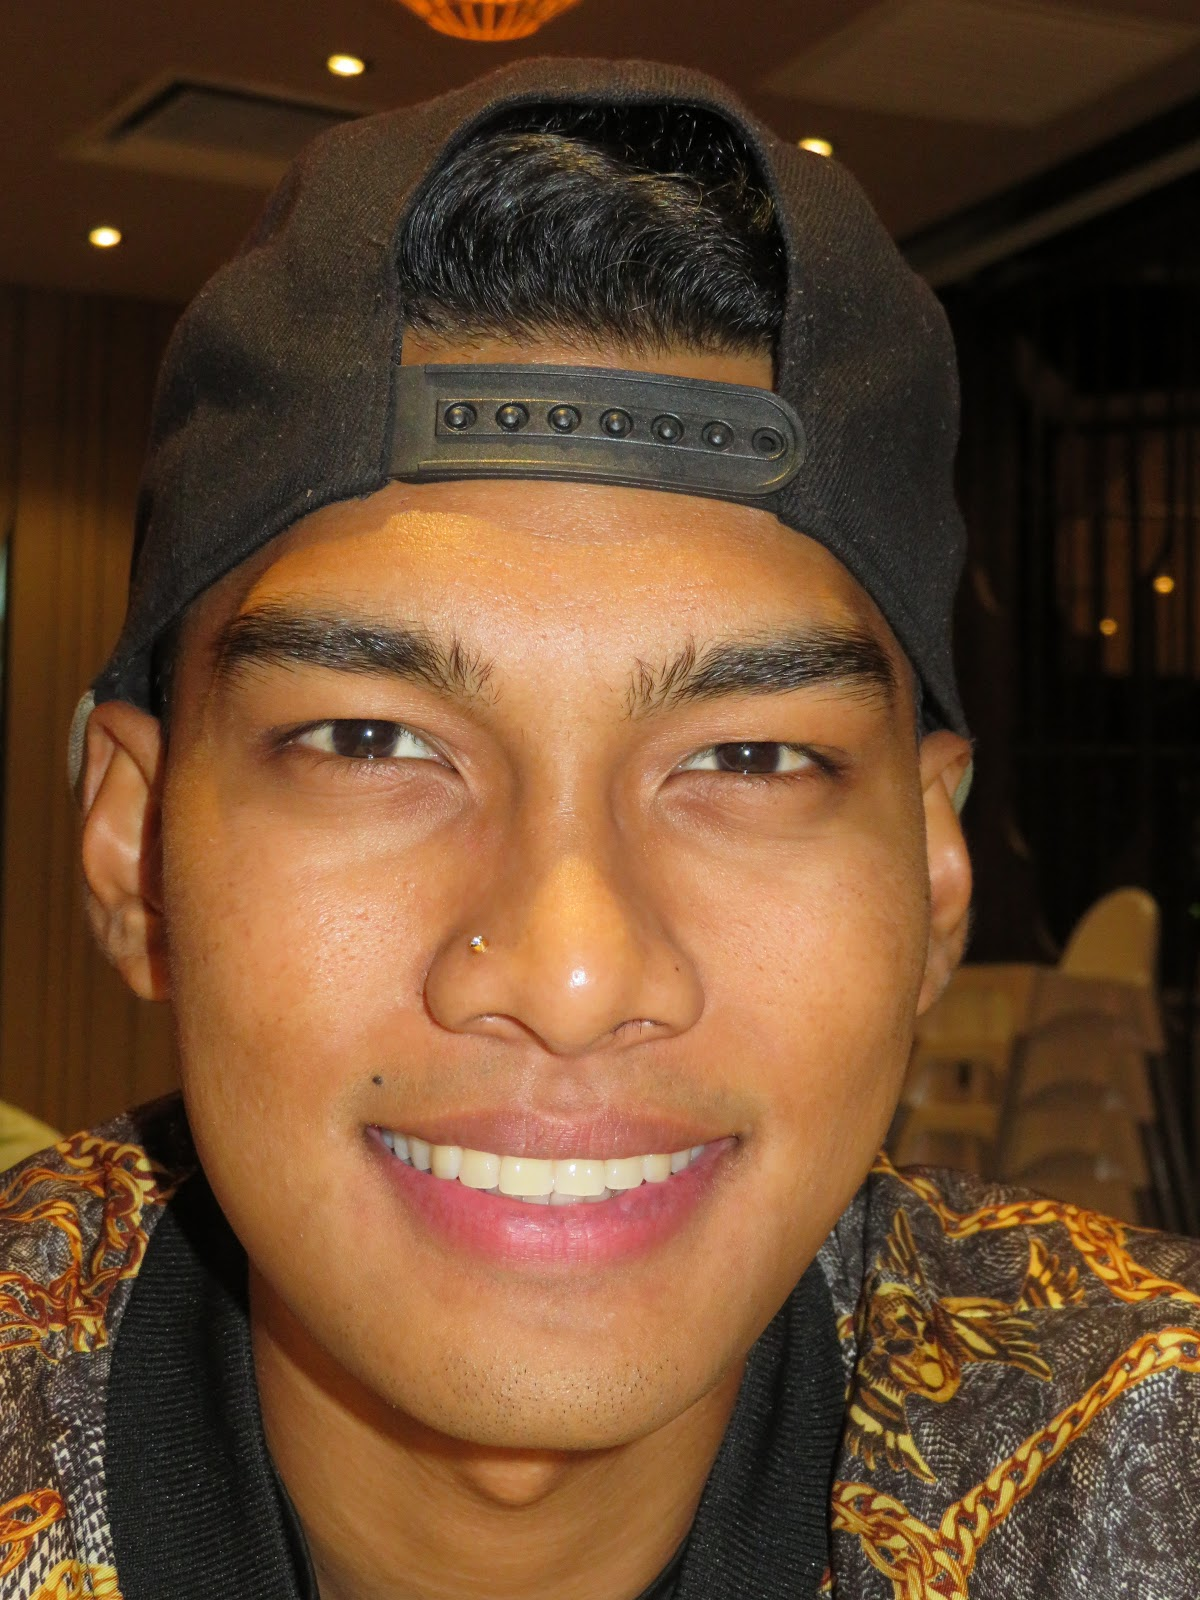 Kee Hua Chee Live Prabu Brandon Rules Ok With His